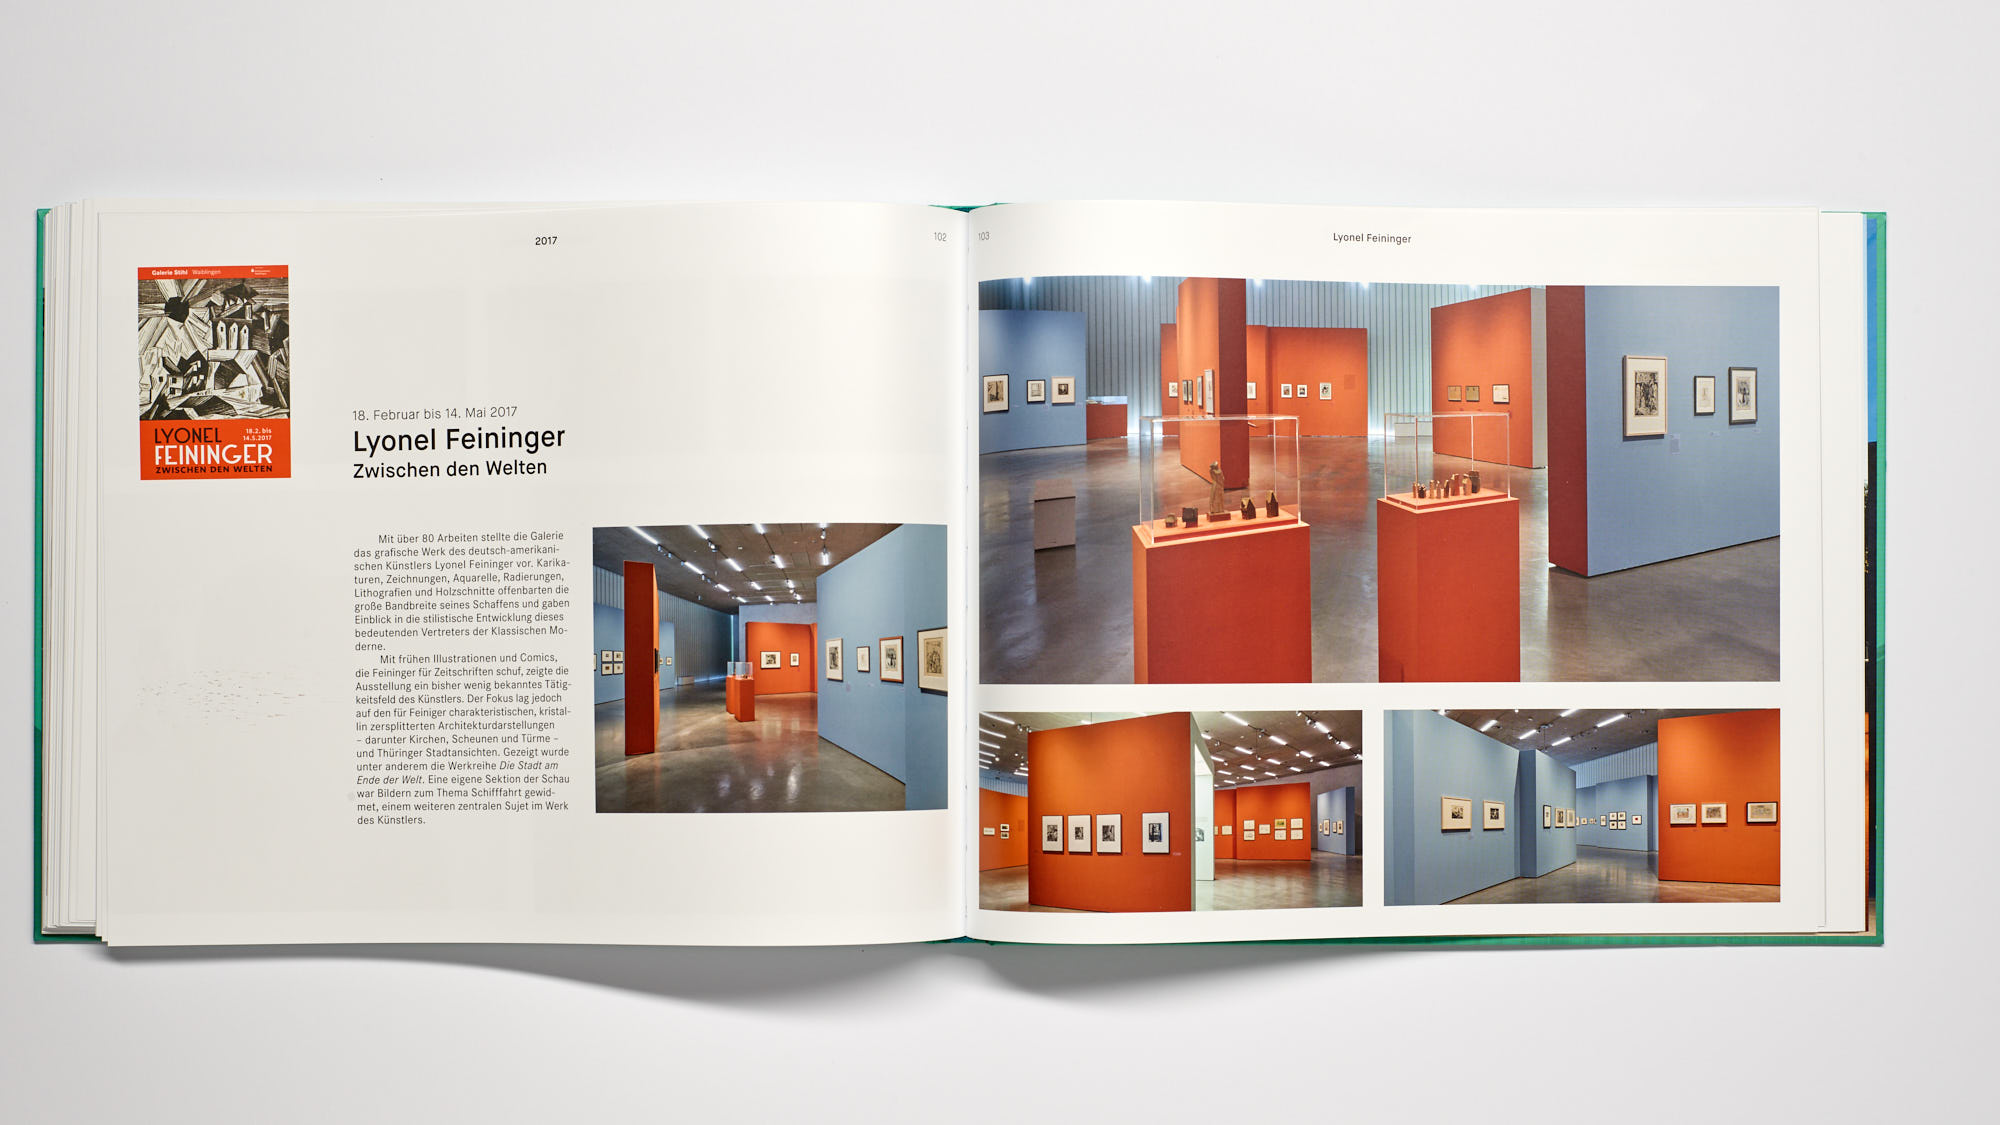 Stihl Galerie WN Feininger - 10 Jahre Galerie Stihl Waiblingen